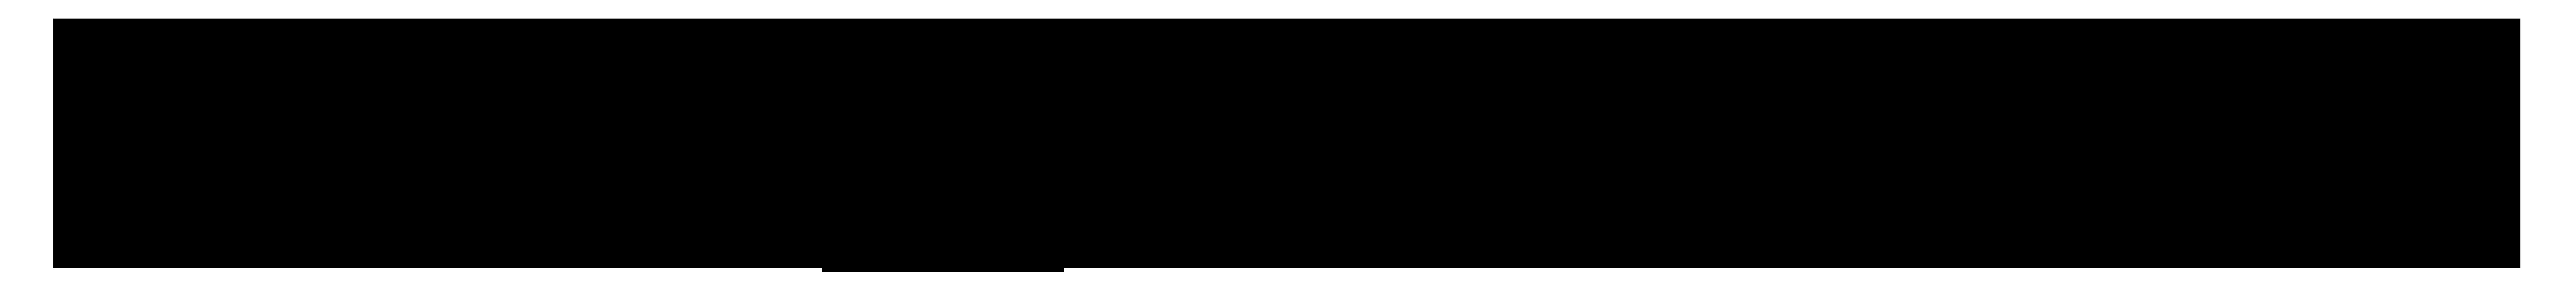 STUDIOFAMEUS